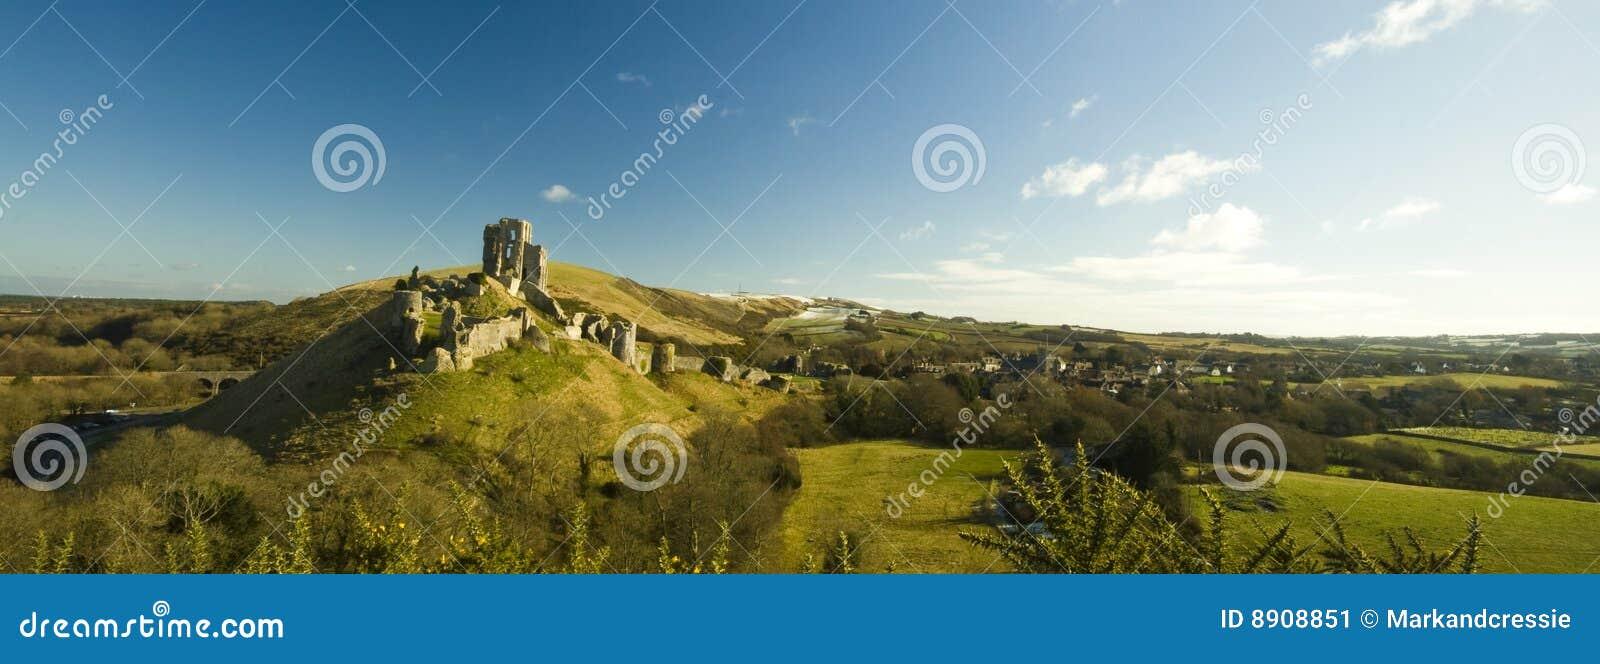 Corfe Castle ruins near Swanage in Dorset